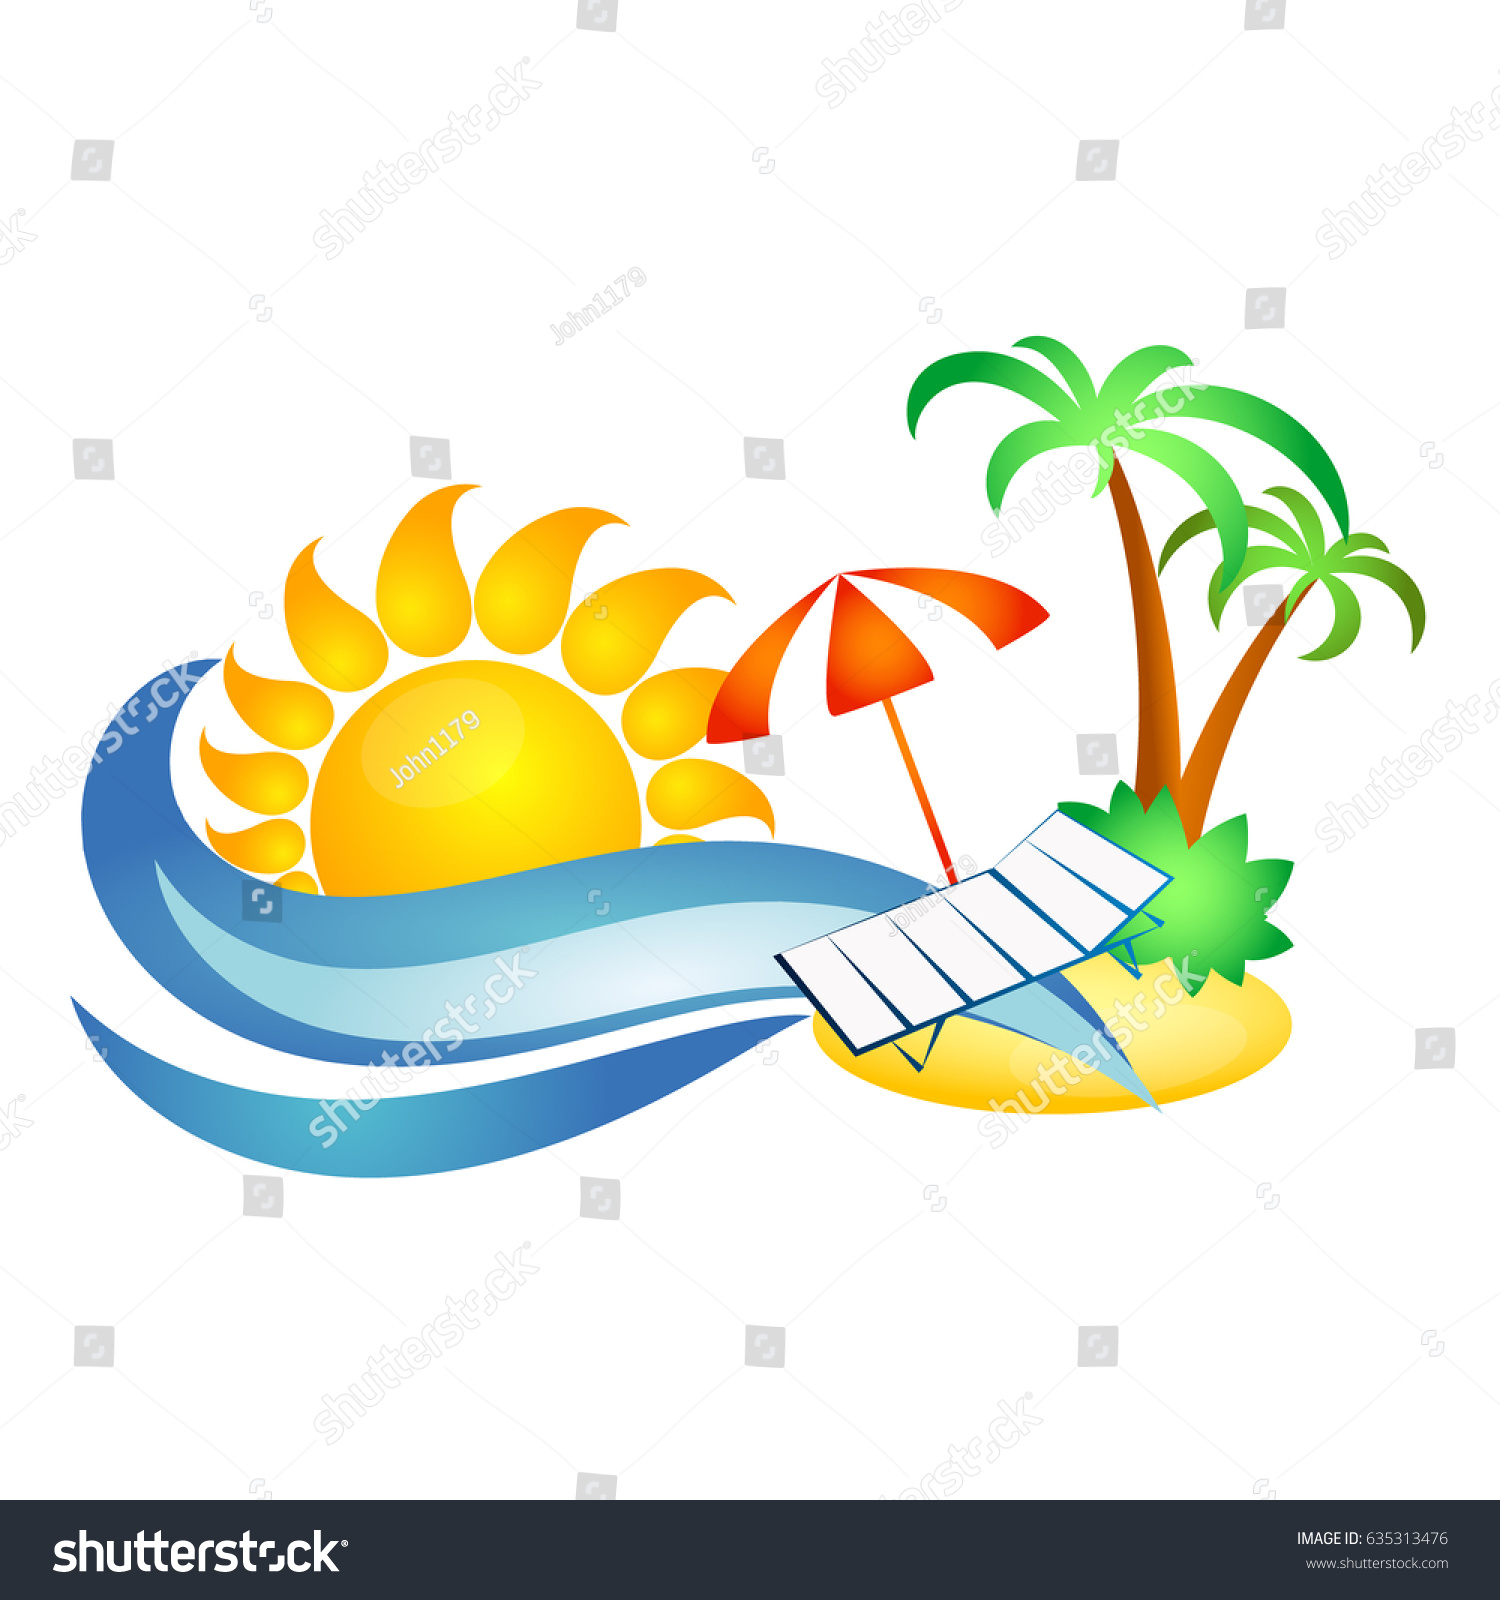 Symbol travel recreation sun sea wave stock vector 635313476 symbol for travel and recreation sun and sea wave palm trees and chaise longue biocorpaavc Choice Image